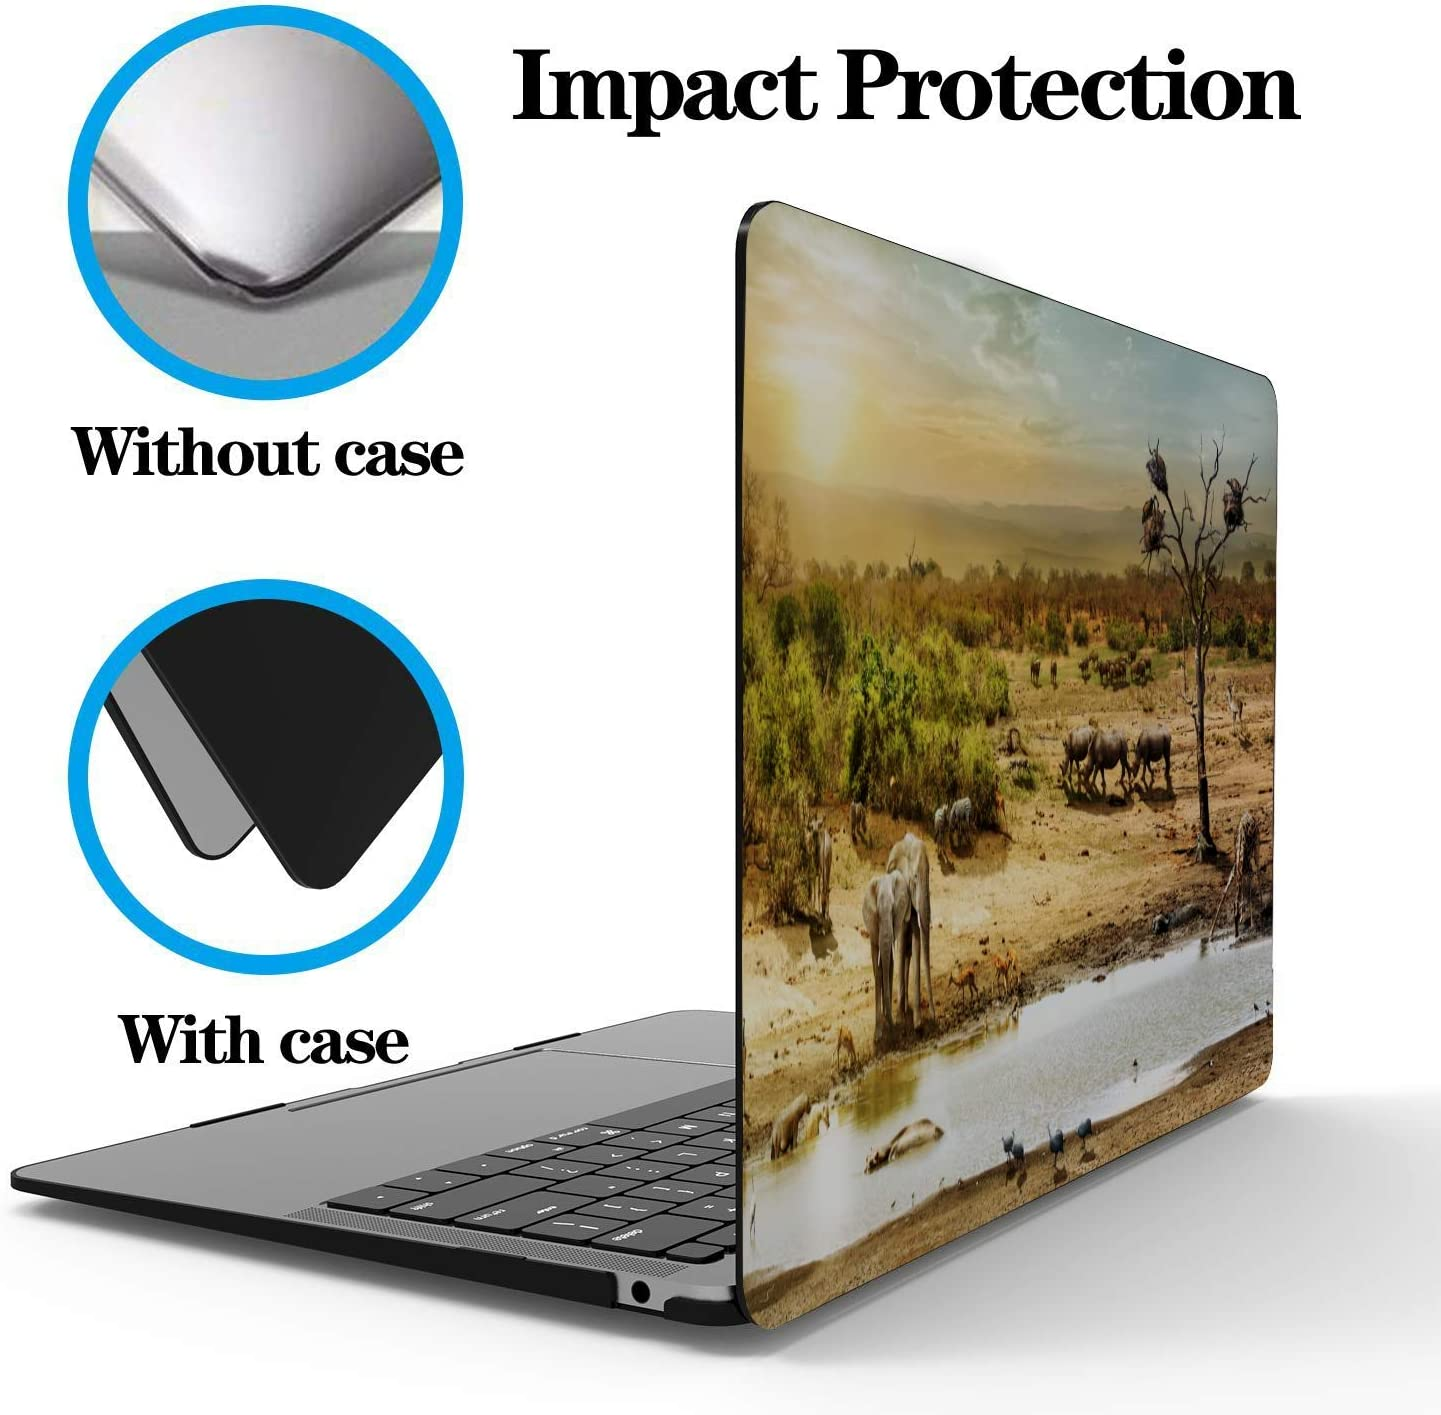 MacBook 13 Inch Case Rose Window Notre Dame De Paris Plastic Hard Shell Compatible Mac Air 11 Pro 13 15 MacBook Air 2018 Case Protection for MacBook 2016-2019 Version